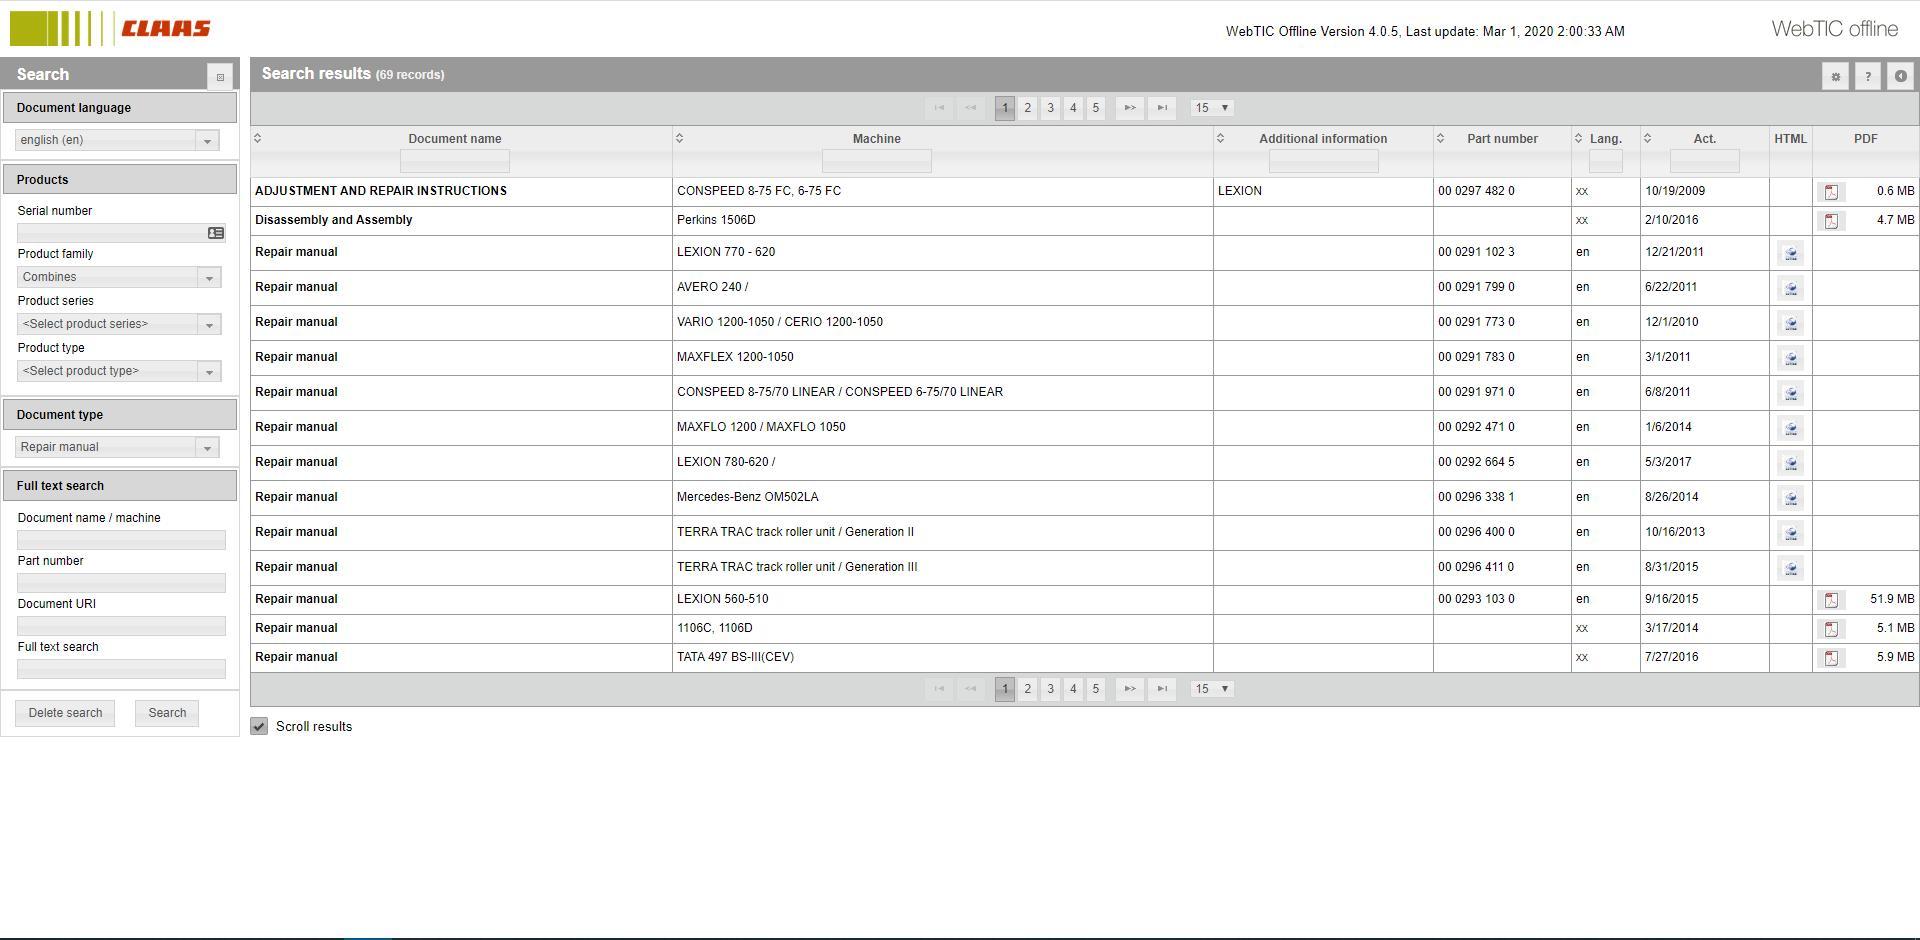 CLAASWebTICOffline2020RepairandServiceDocumentation7